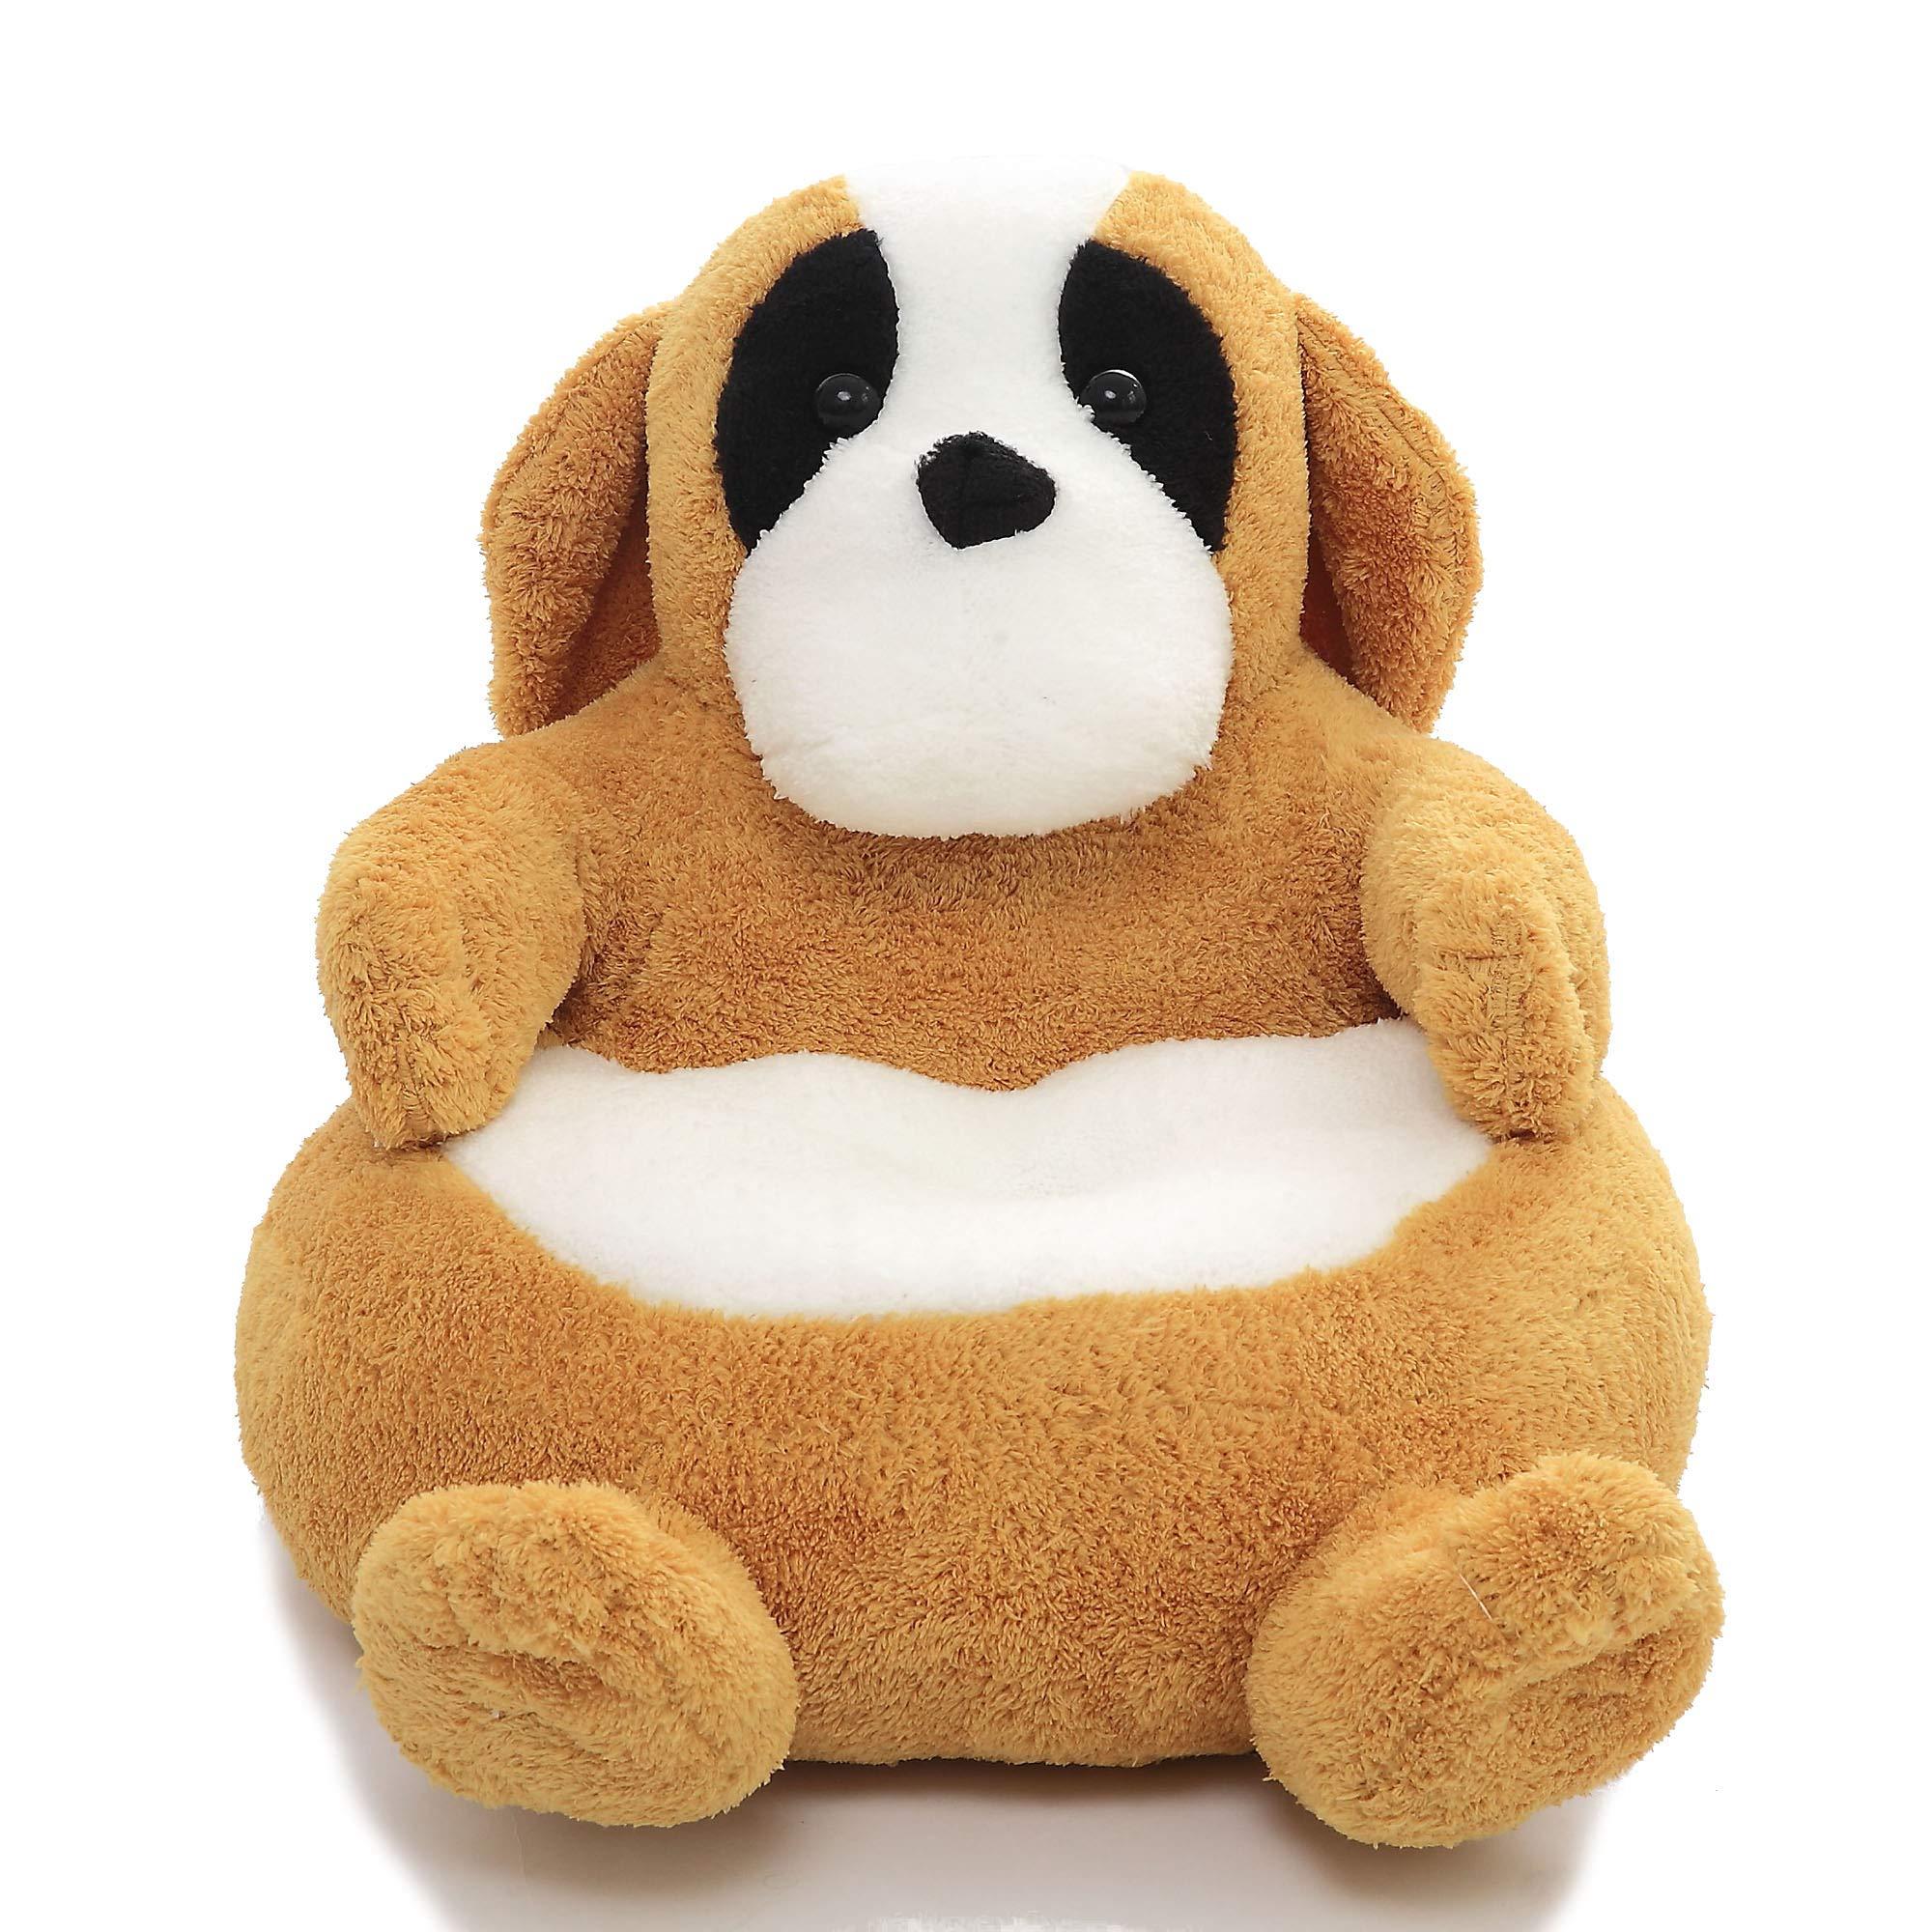 YXCSELL Furniture, Kids Chair PP Cotton Cartoon Dog Animal Lovely Character Sofa, Seat Pad Circular Soft Comfortable Kids Sofa